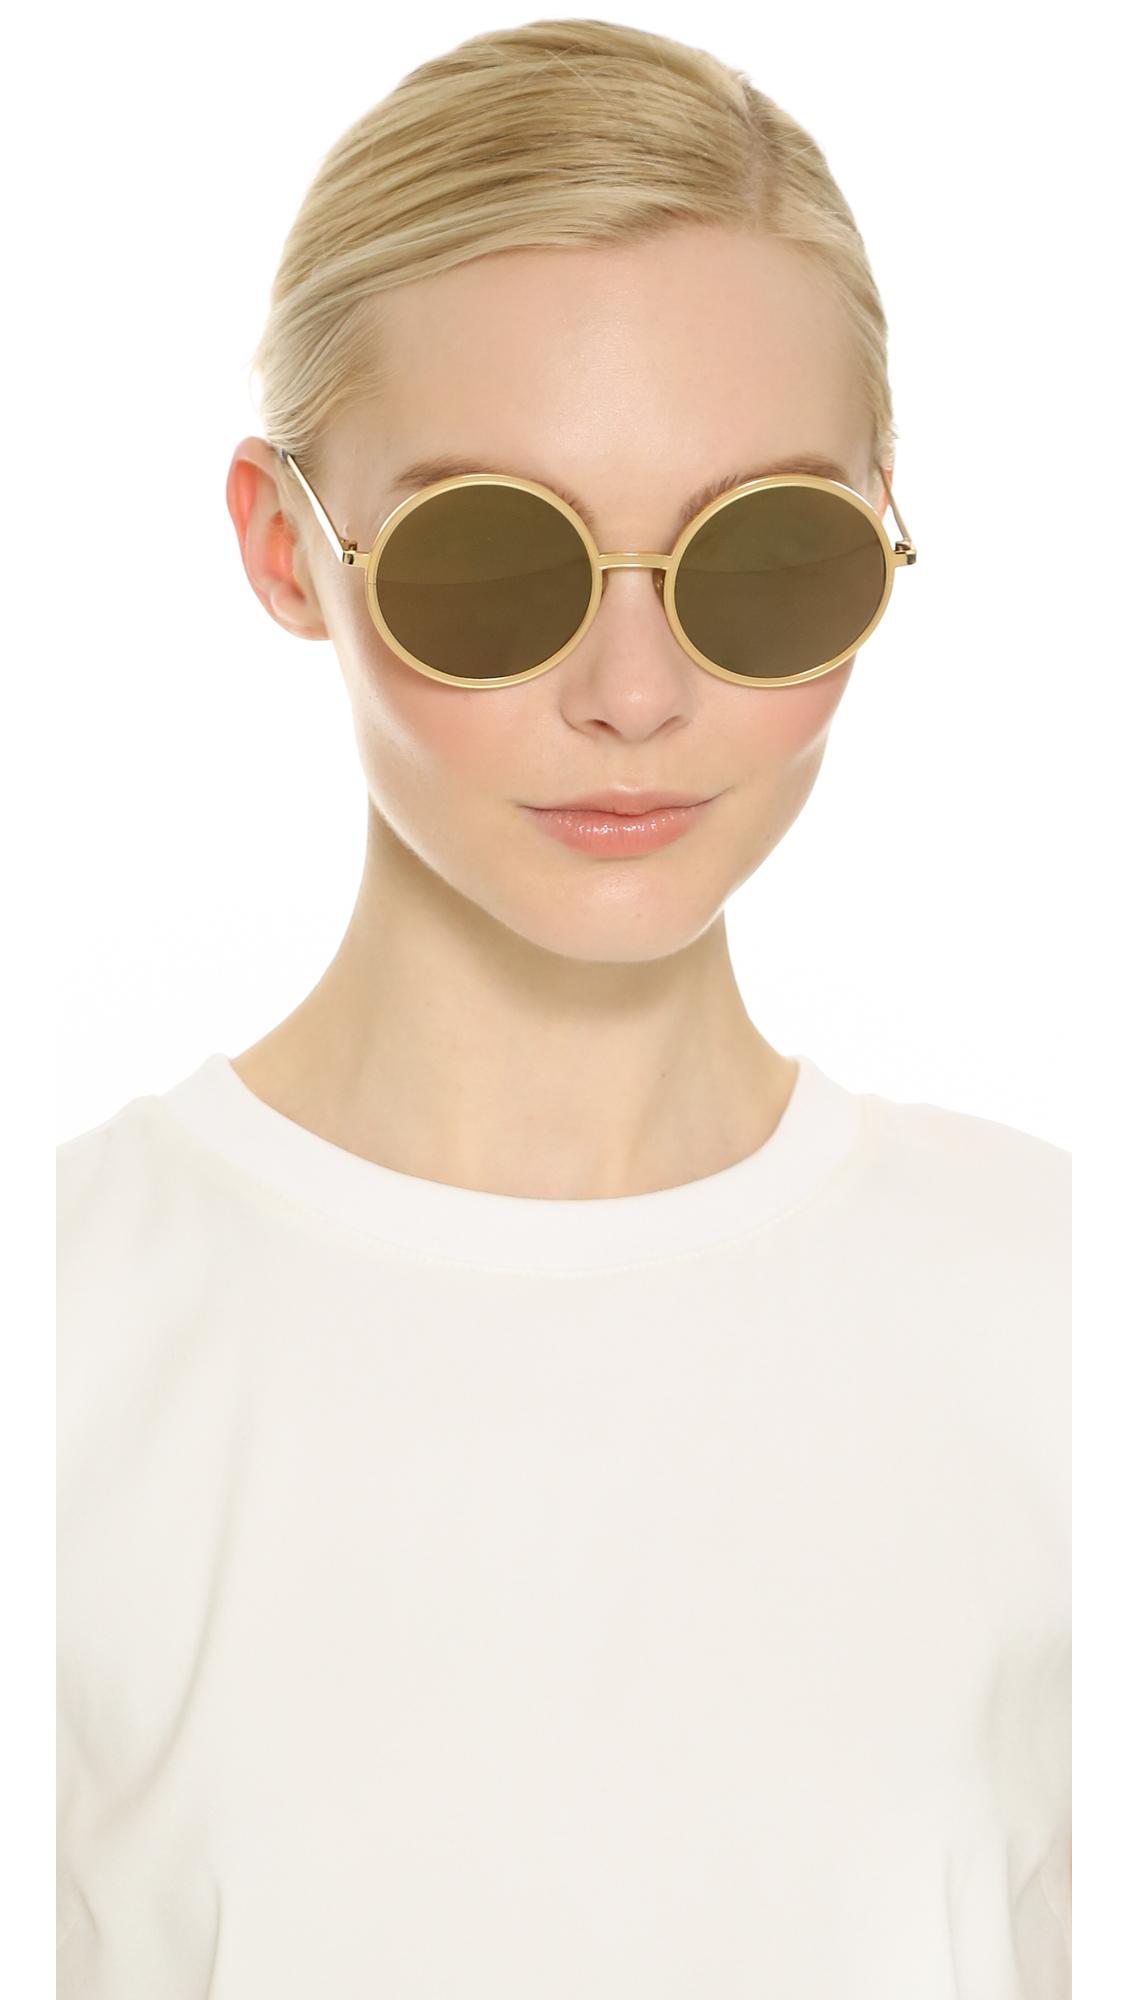 cc71ab283 Sunday Somewhere Charlie Sunglasses - Gold/Gold Mirror in Metallic ...